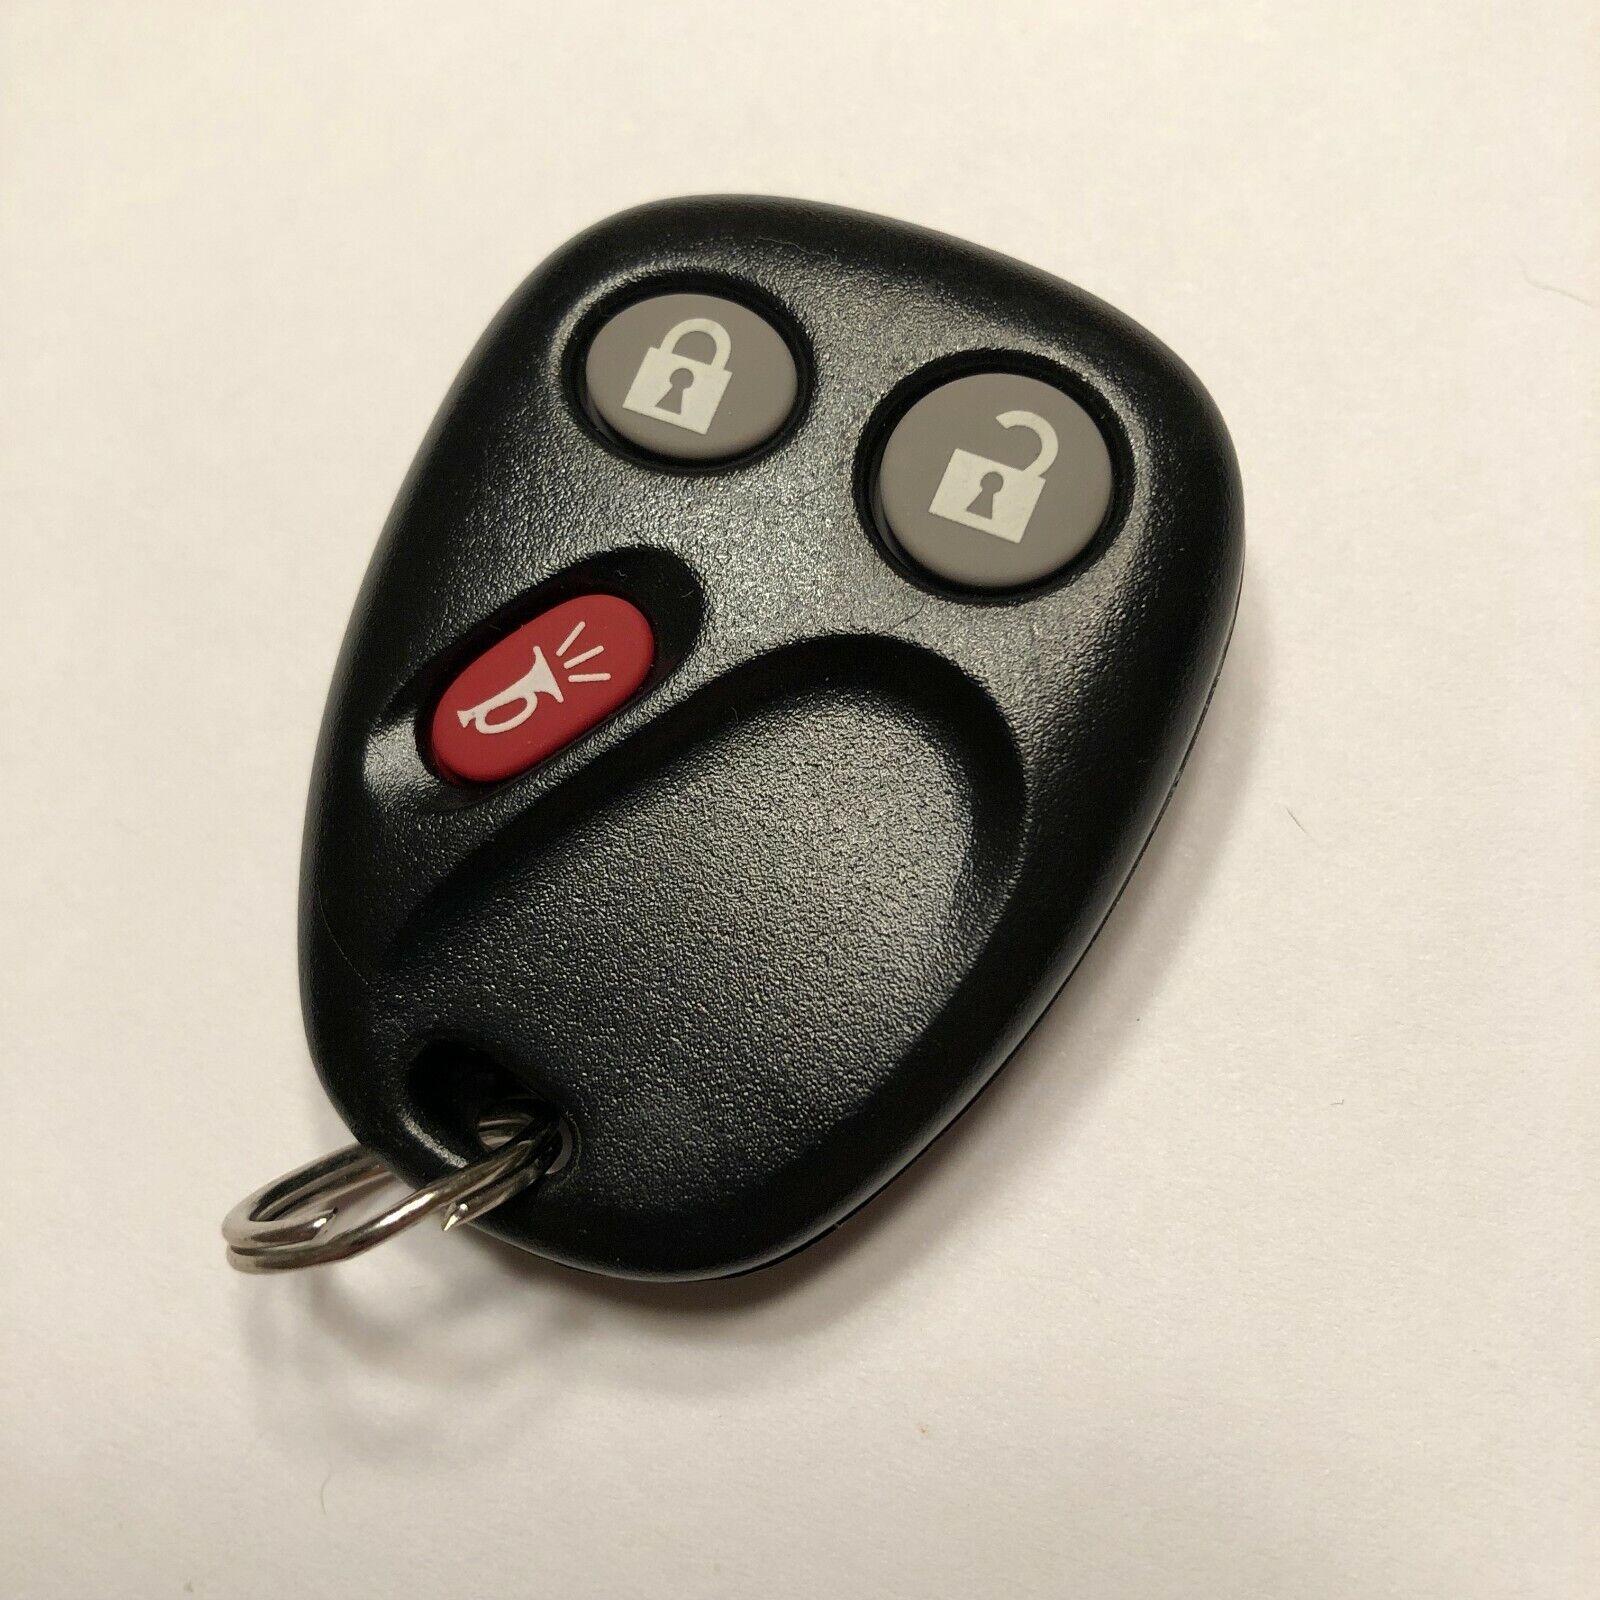 Fit tо New Keyless Entry Remоte Fоb Trаnsmitter 01-12 Сhеvrоlеt GМC НUММЕR 10335583